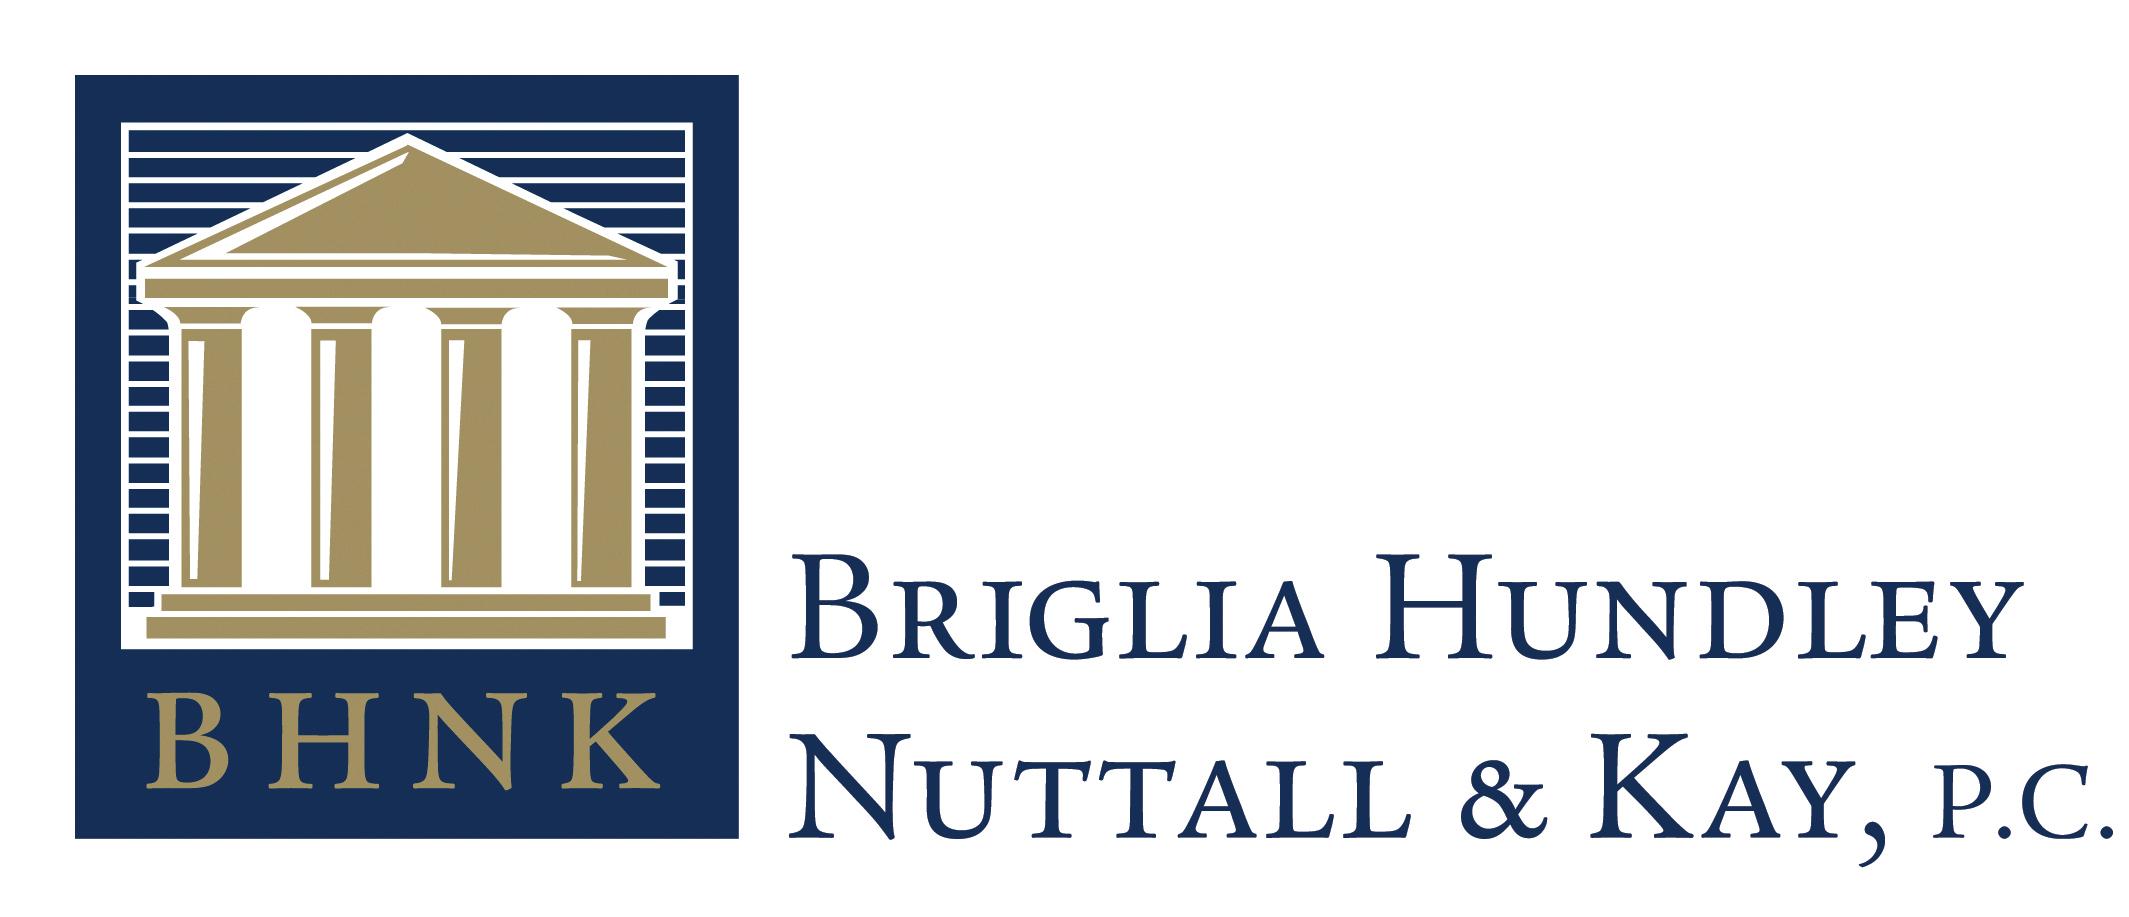 Briglia Hundley Nuttall Kay P C In Vienna Va 703